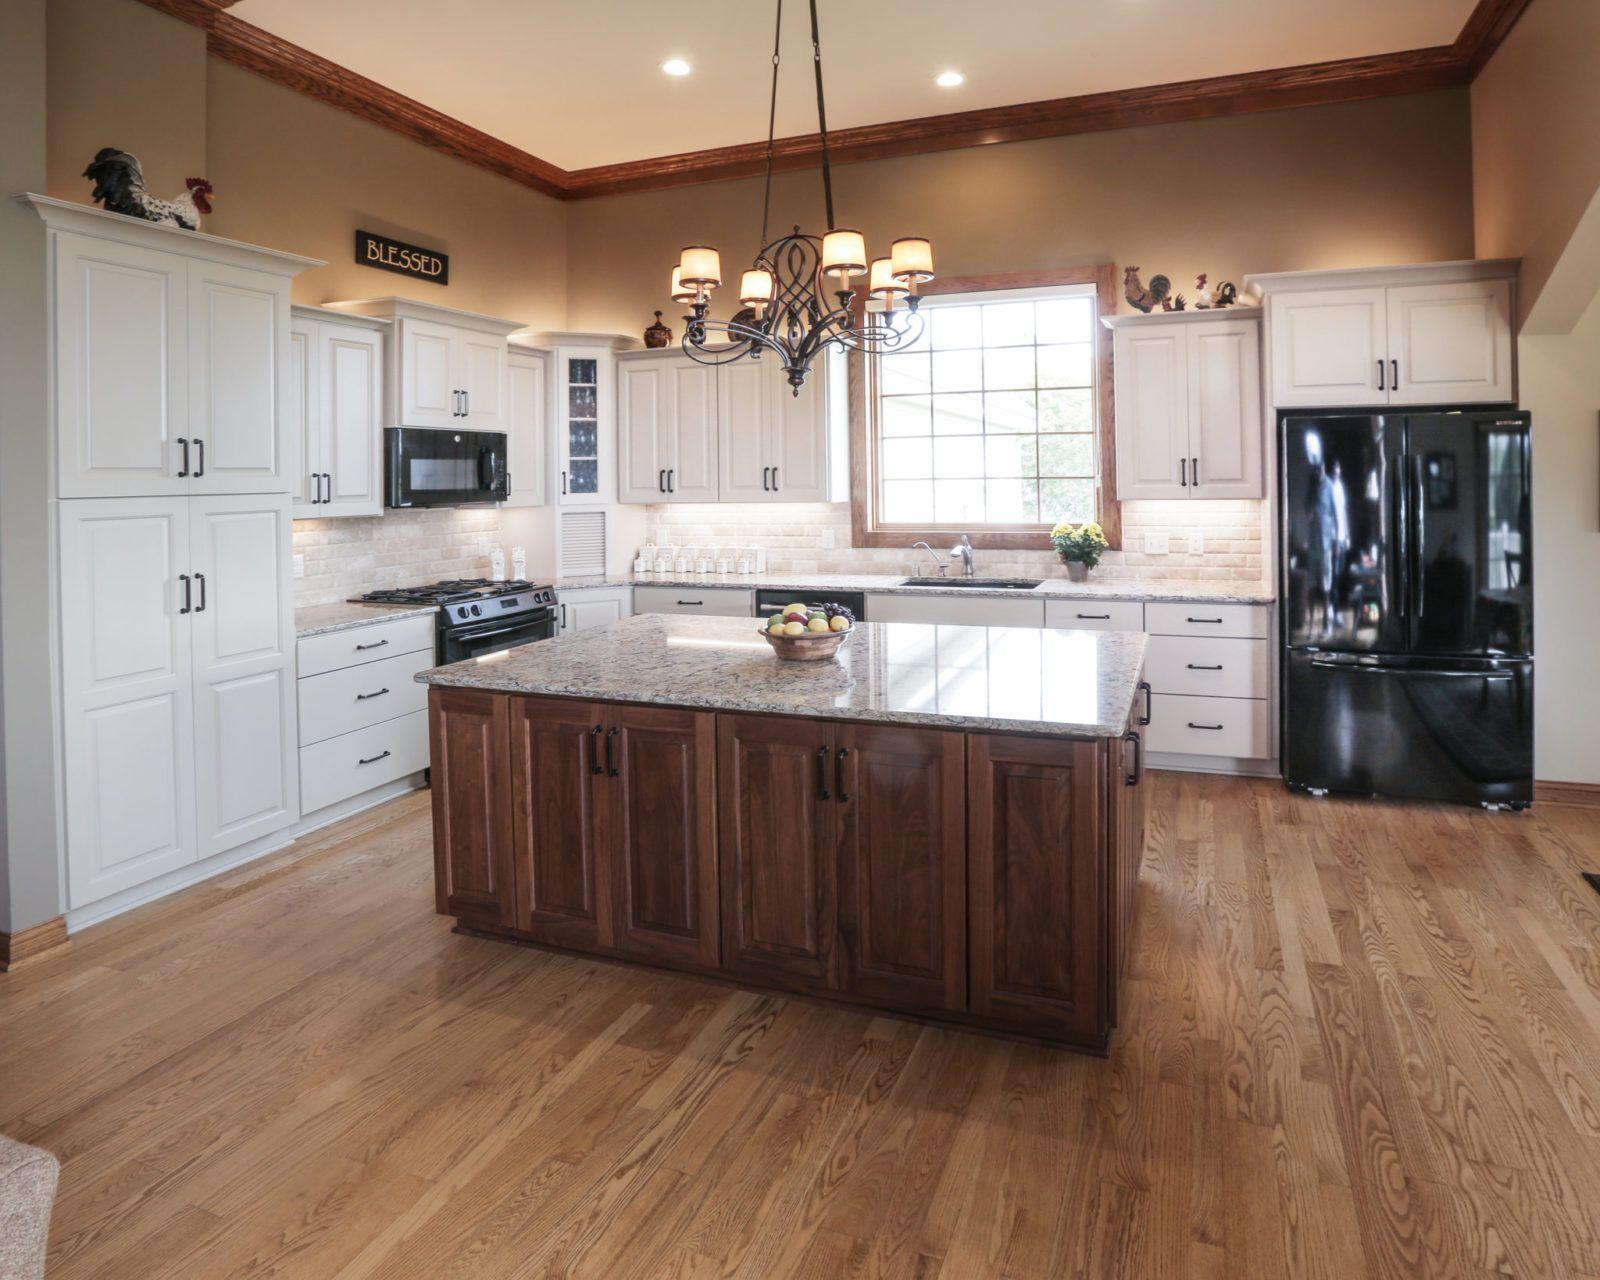 Update Golden Oak Kitchen Diy Projects Diy